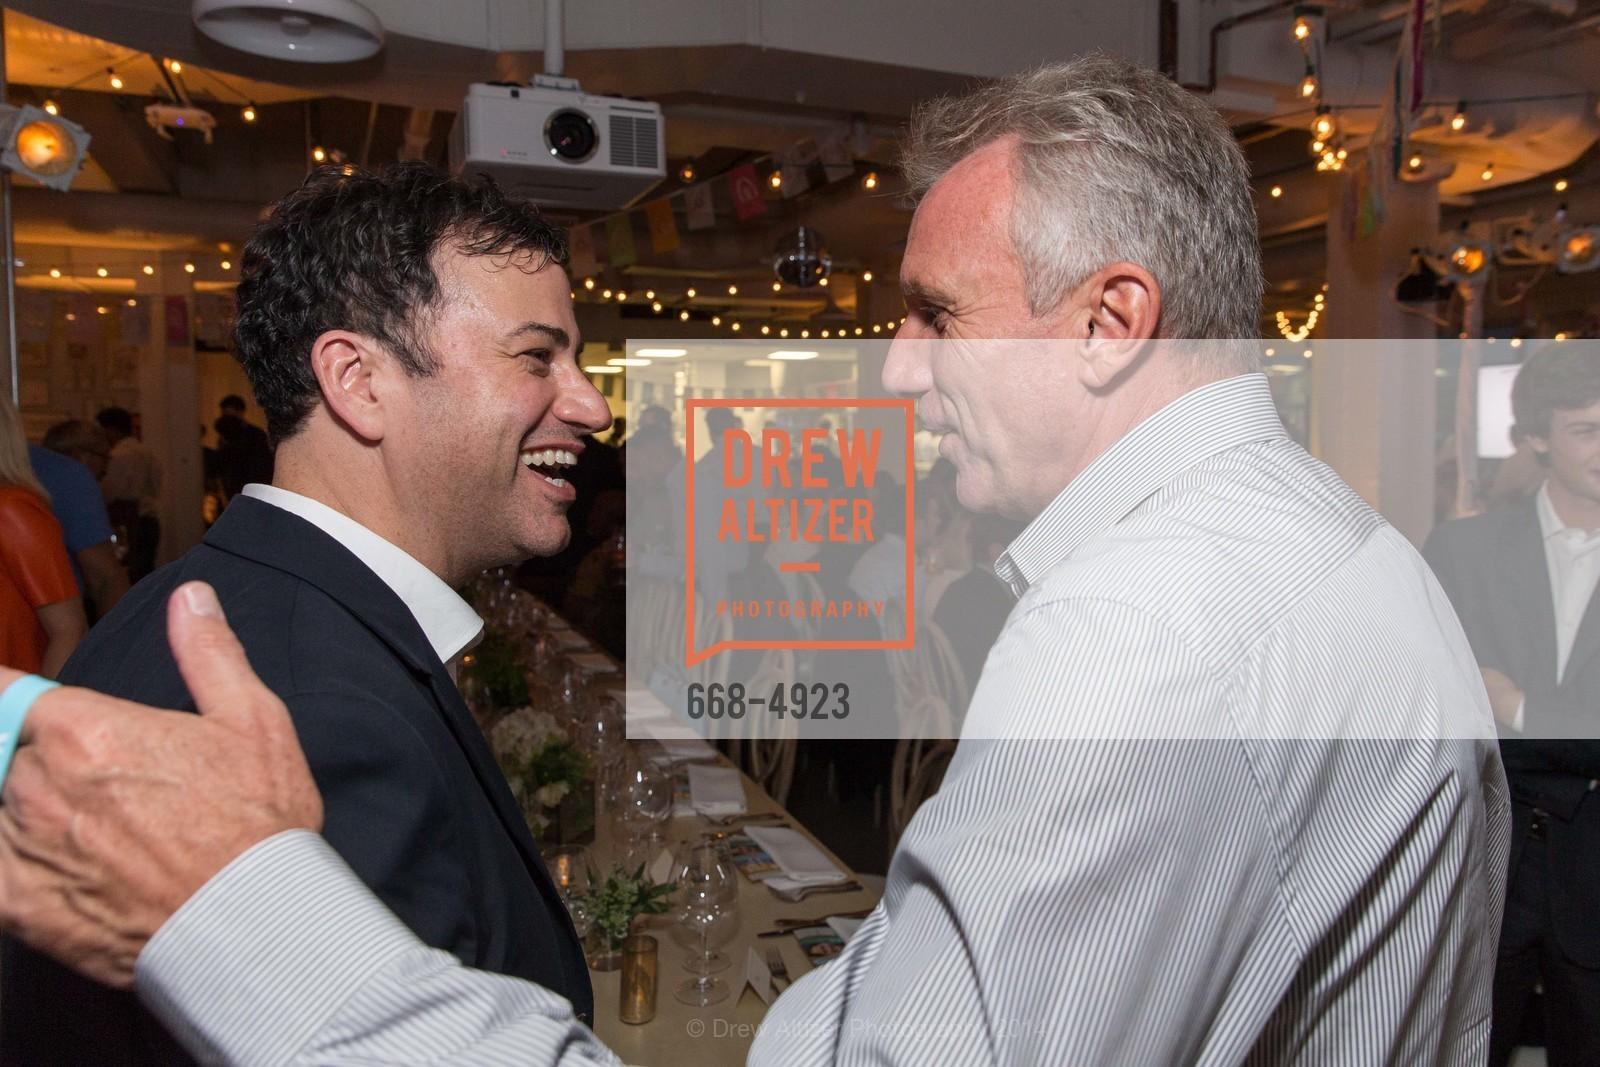 Jimmy Kimmel, Joe Montana, Photo #668-4923